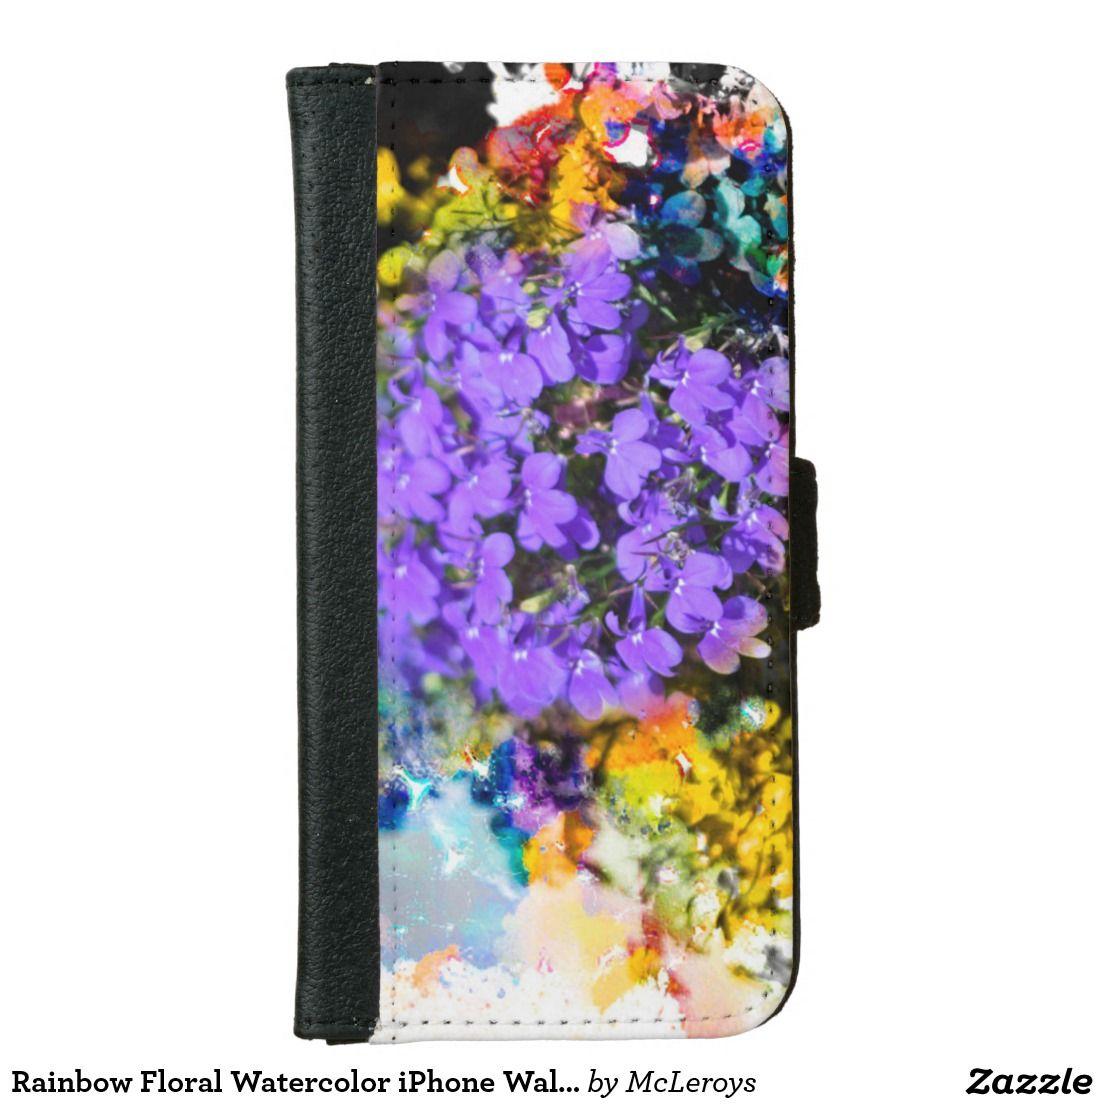 Rainbow Floral Watercolor iPhone Wallet iPhone 6 Wallet Case